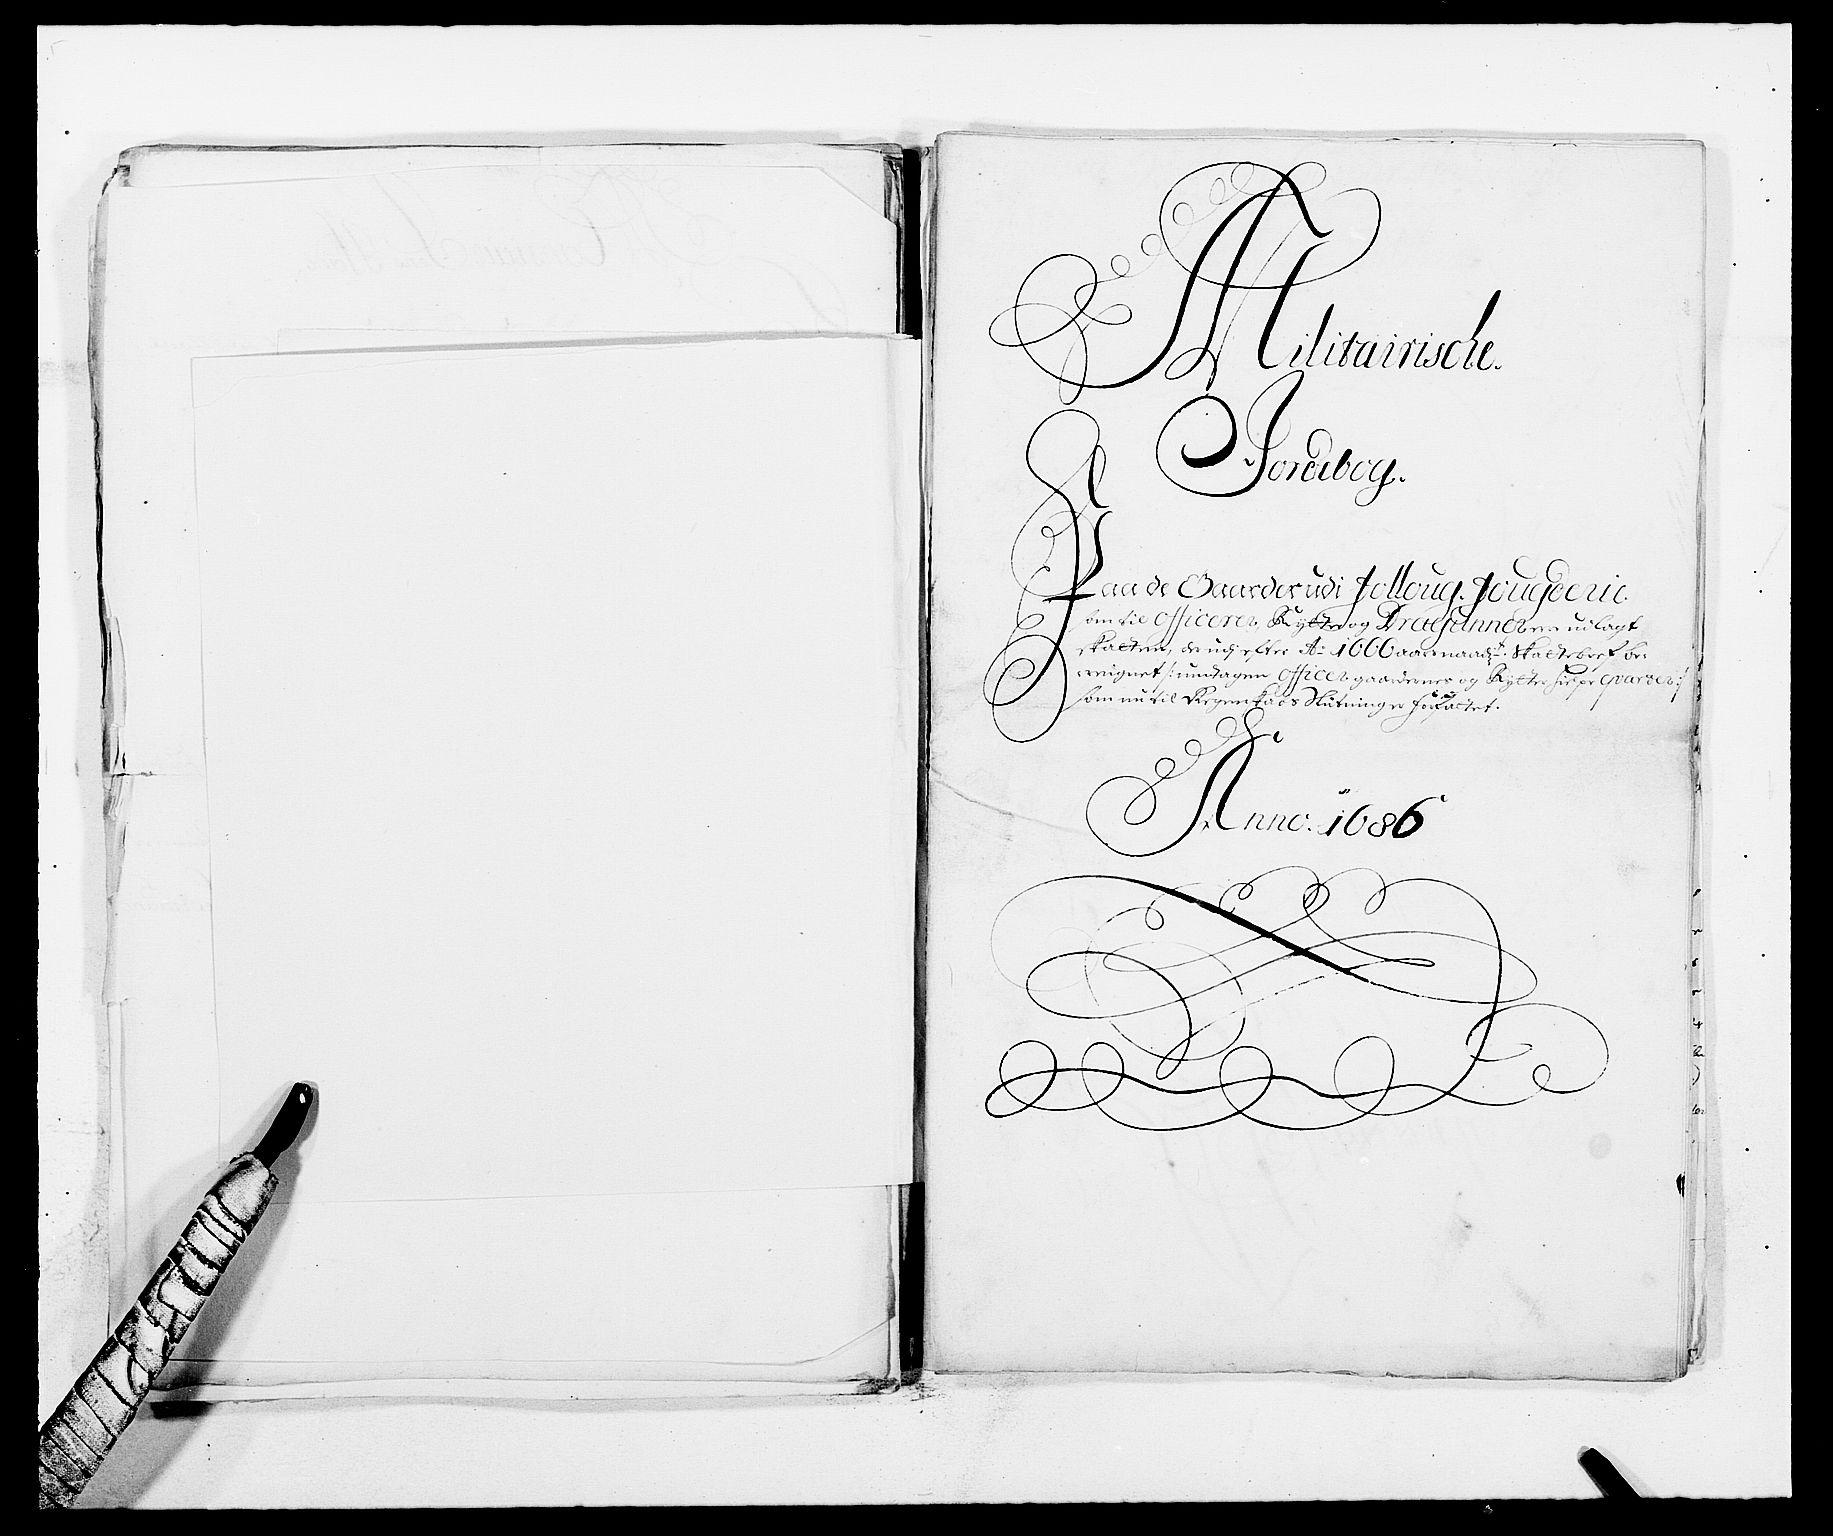 RA, Rentekammeret inntil 1814, Reviderte regnskaper, Fogderegnskap, R09/L0436: Fogderegnskap Follo, 1685-1691, s. 83